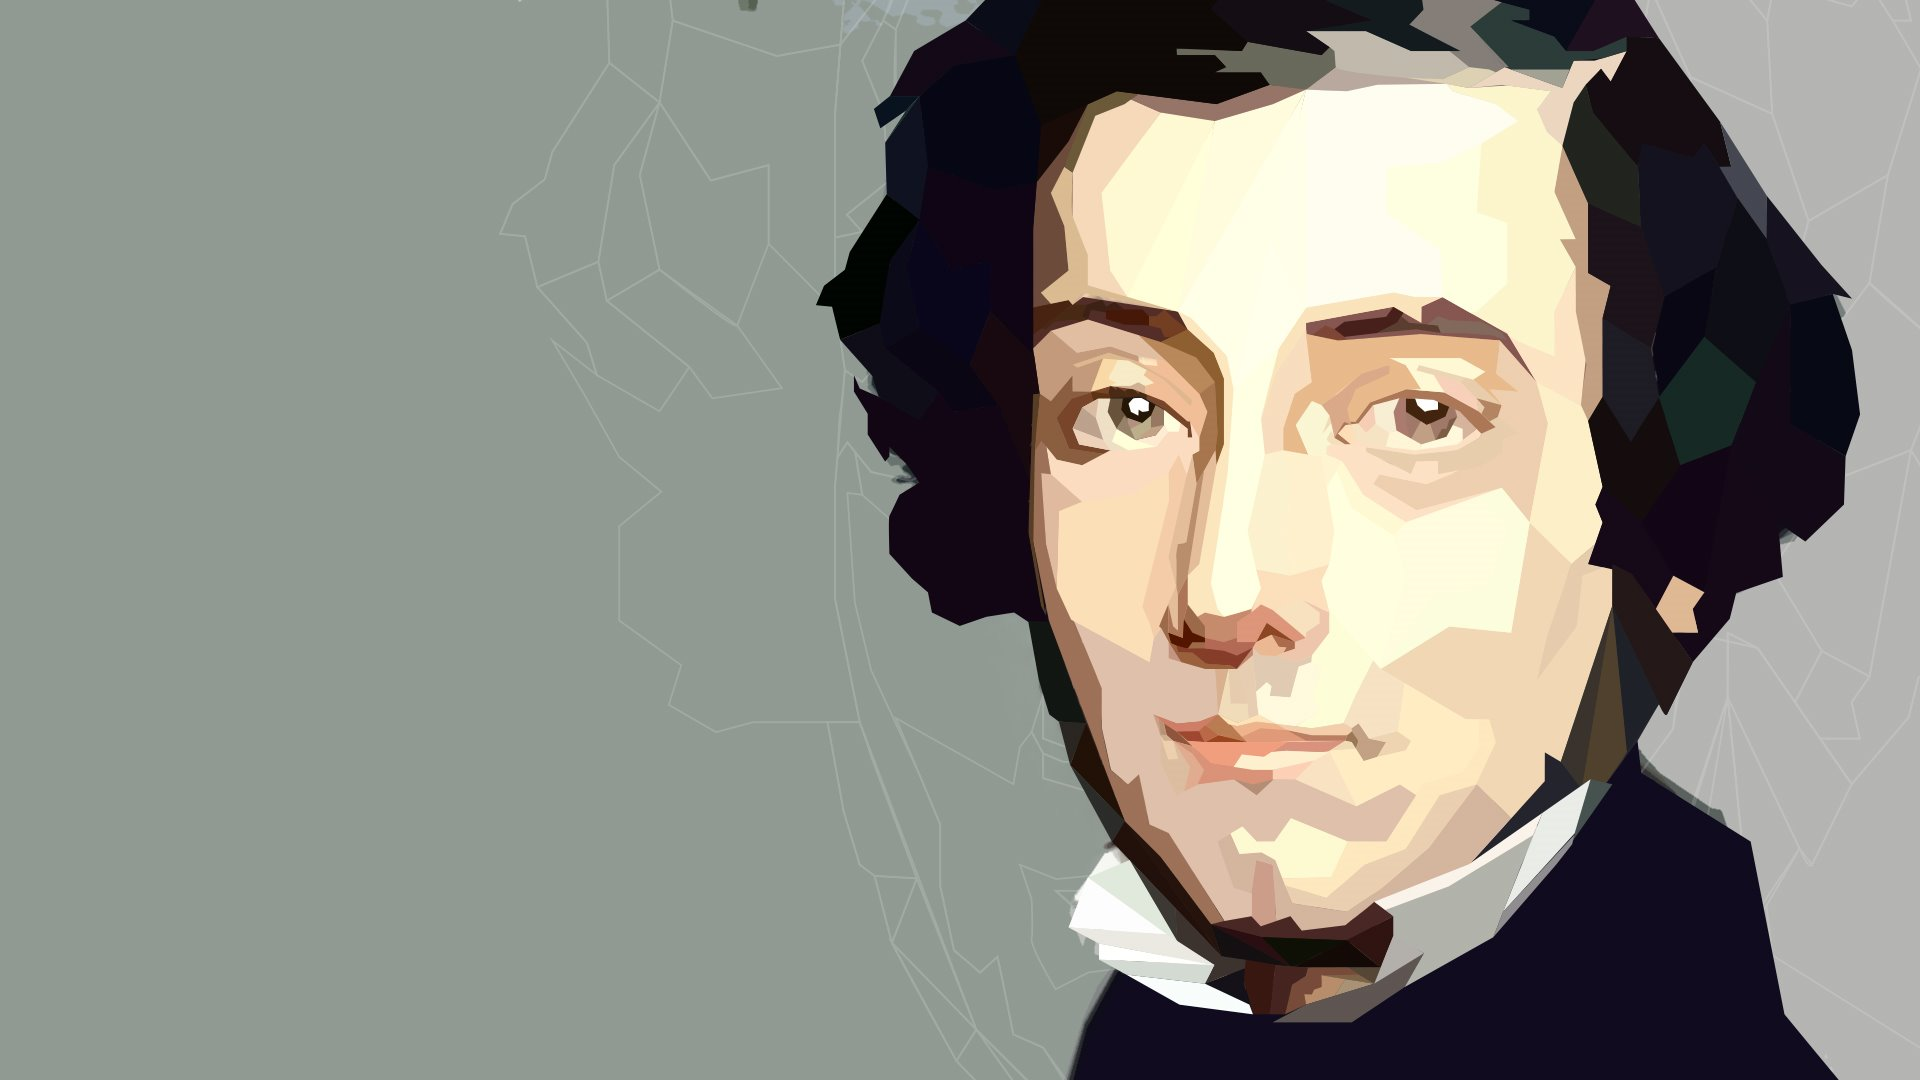 Alexis de Tocqueville: Democracy as thesolution